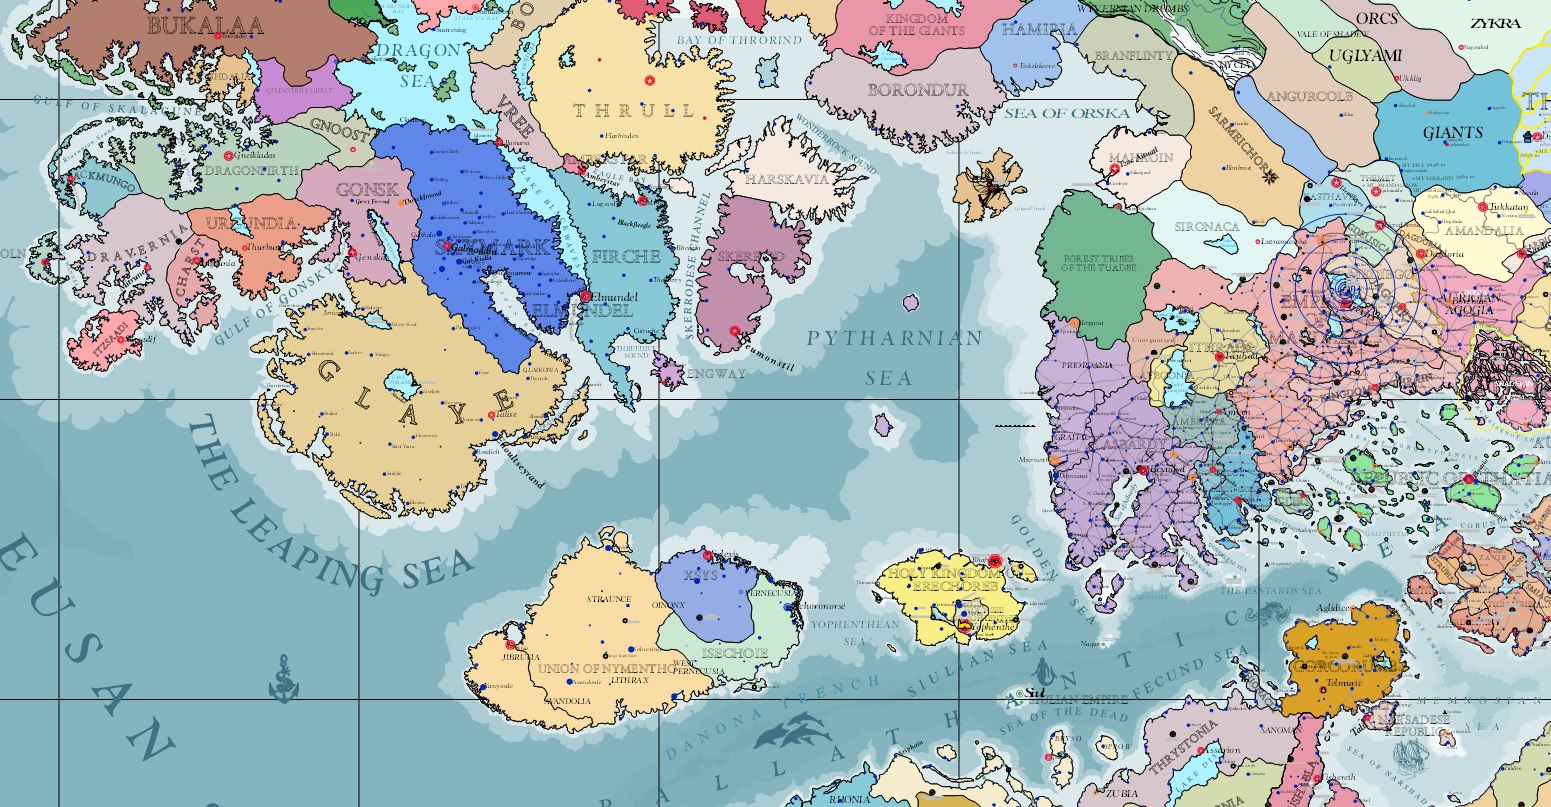 MapPoliticalBarathornPytharnia2740